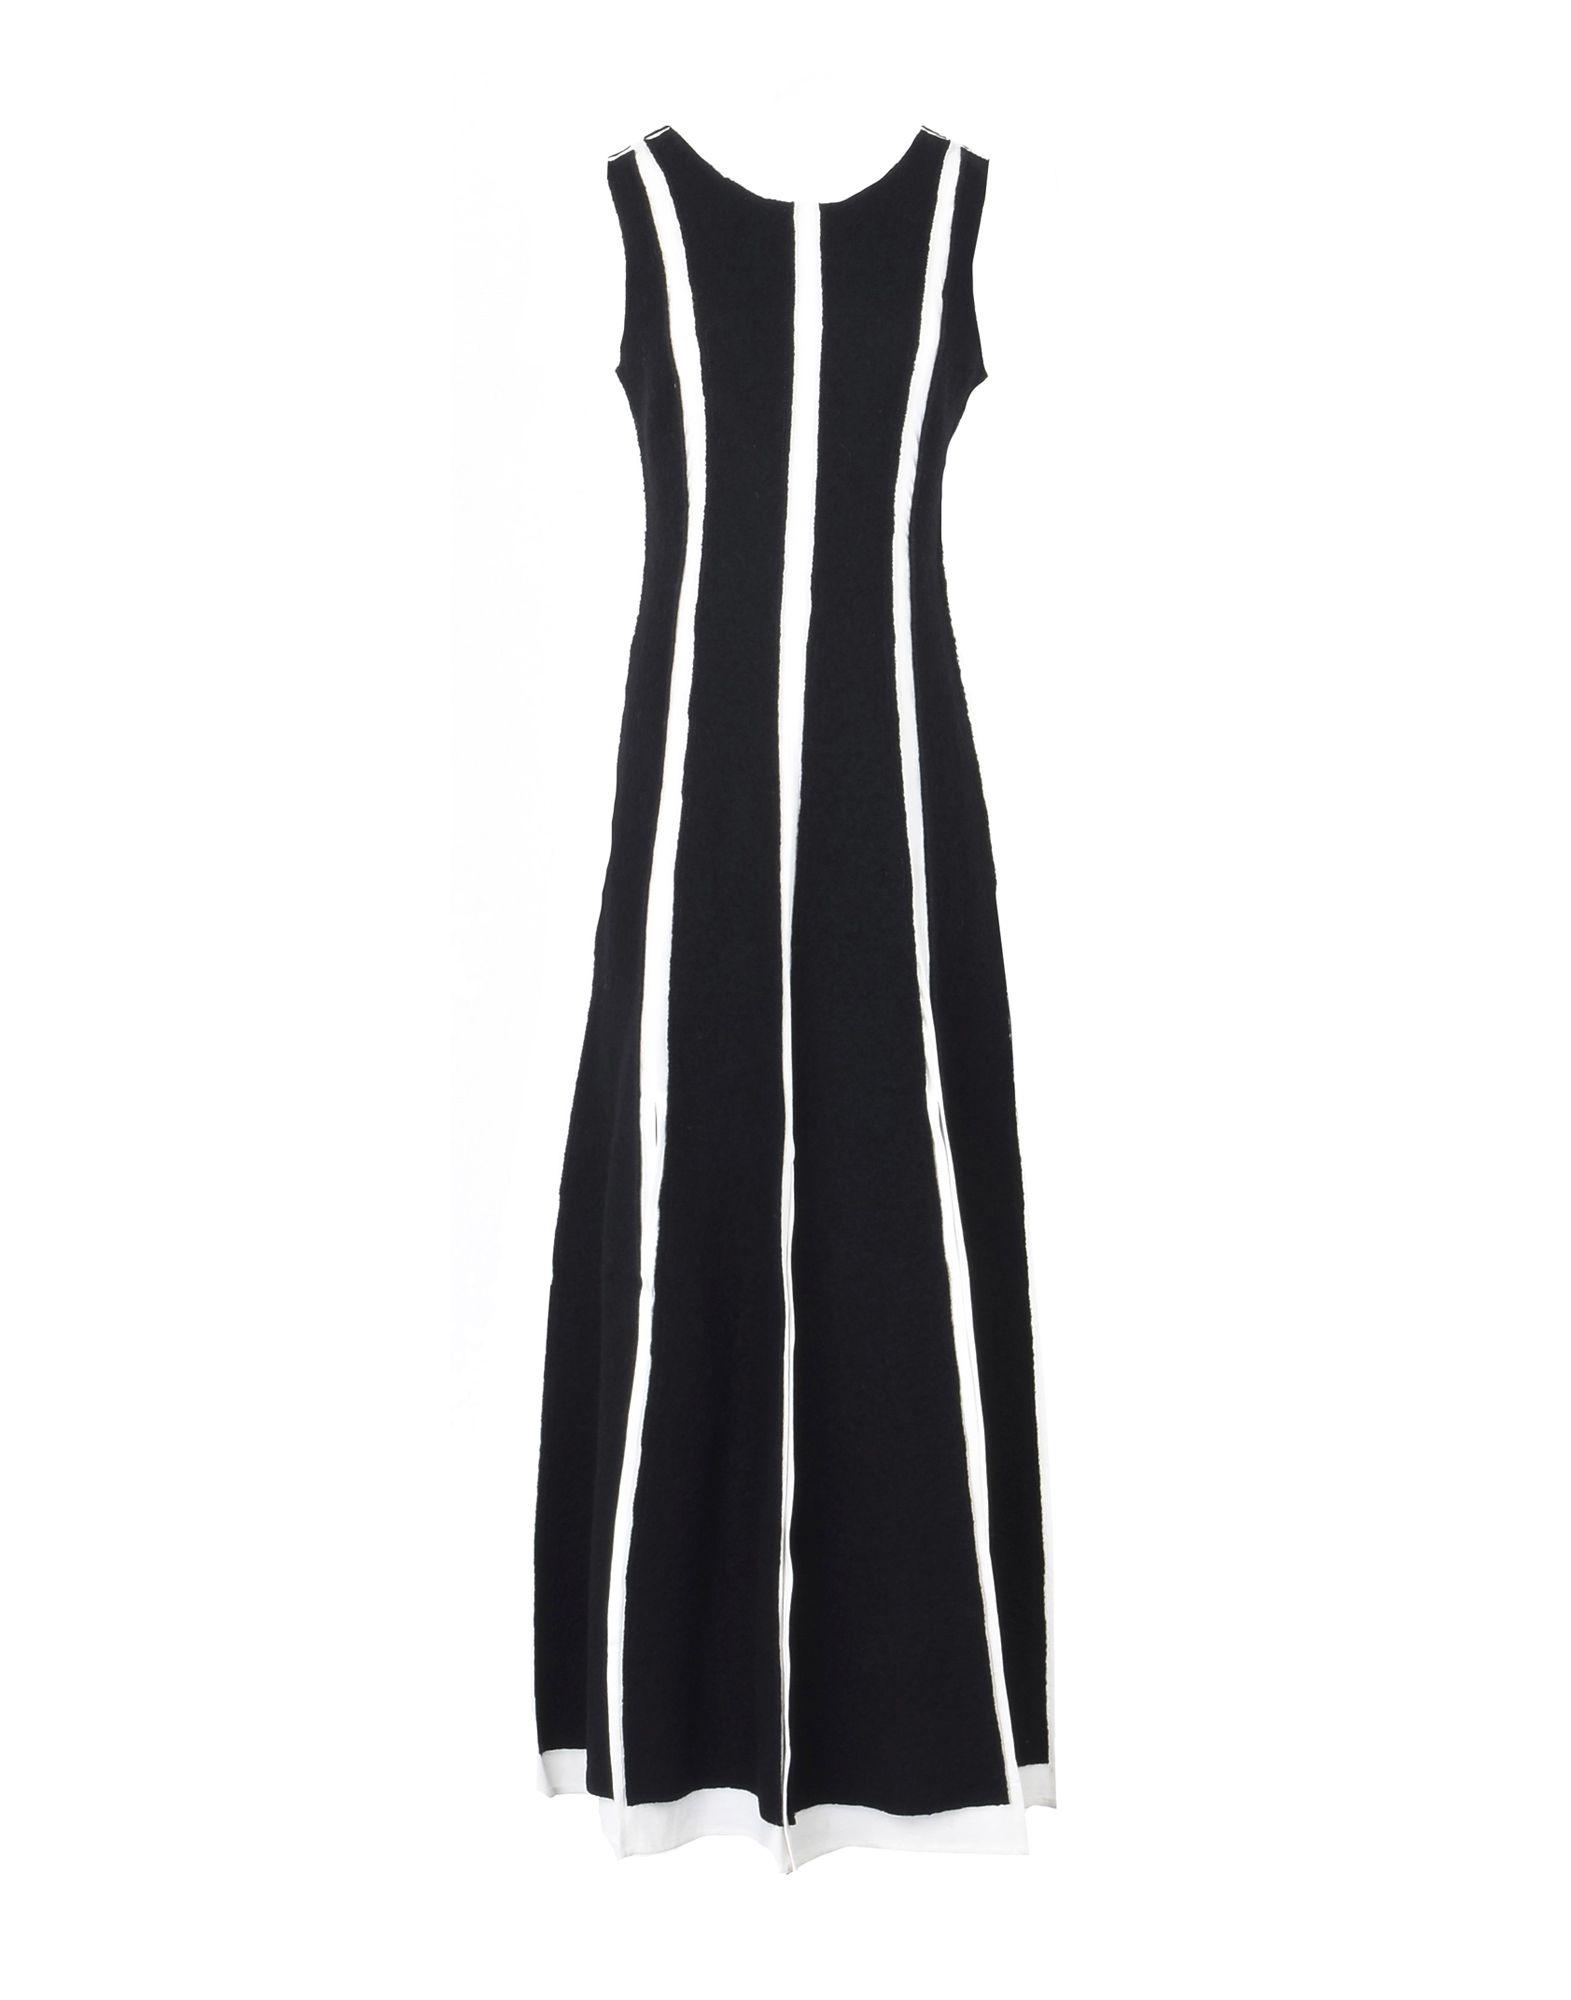 STEPHAN JANSON Длинное платье